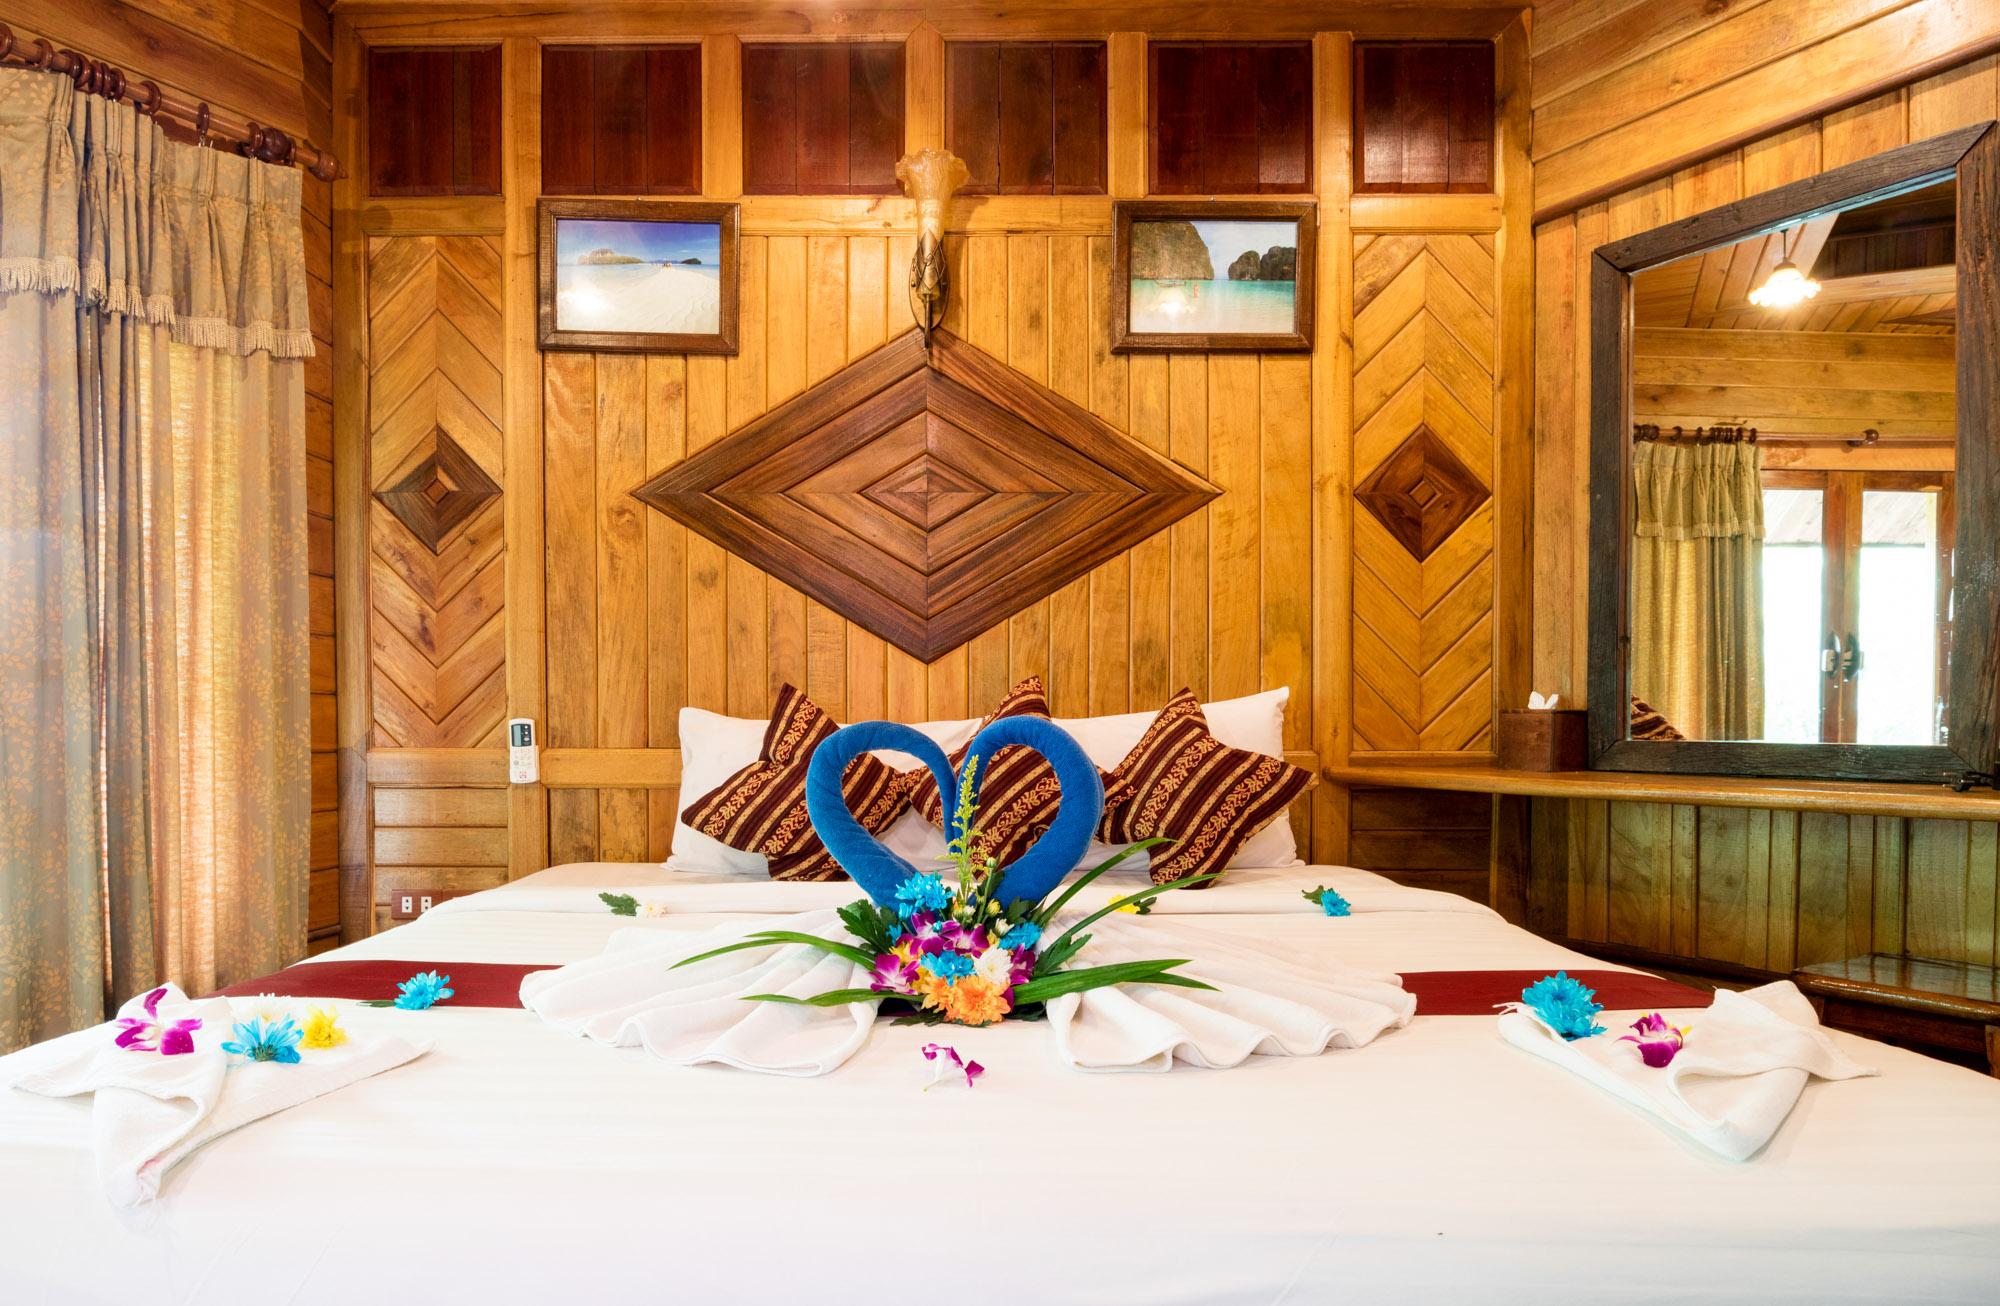 Phu Pha Aonang Resort & Spa  Phu Pha Aonang Resort & Spa ภูผา อ่าวนาง รีสอร์ทแอนด์สปา IMG 5569